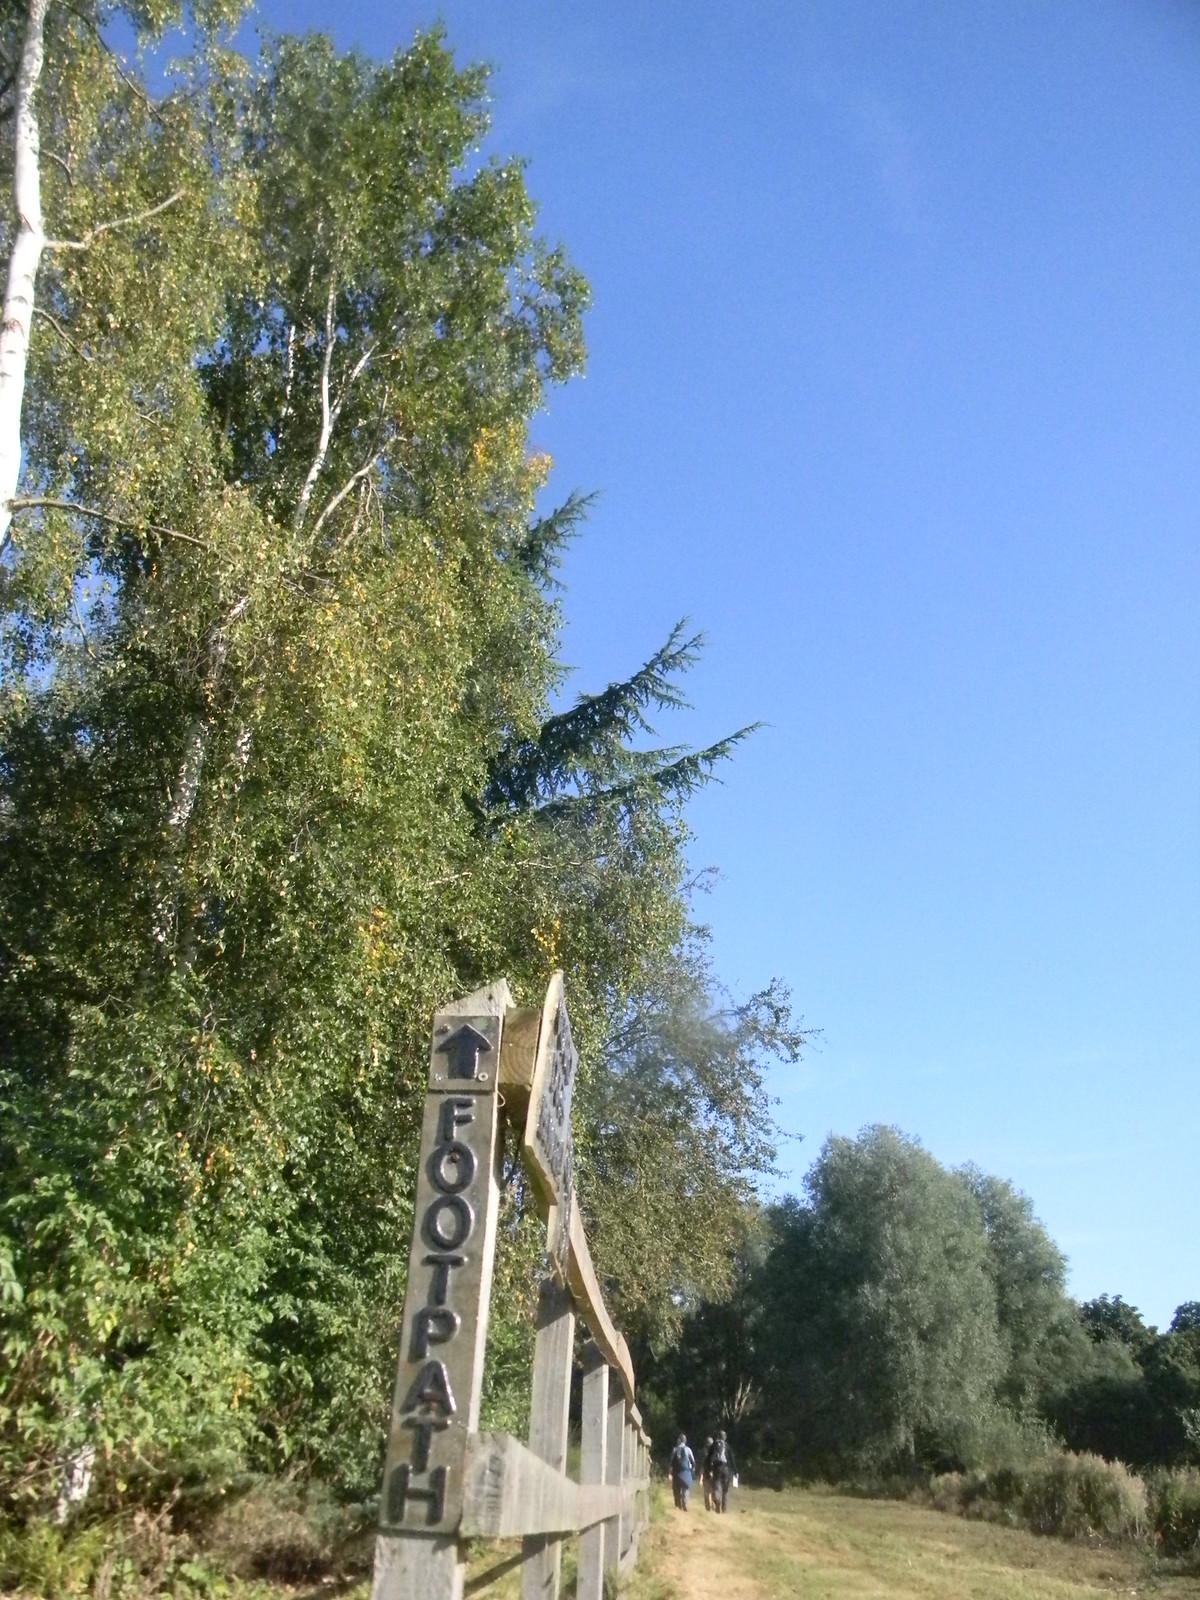 Footpath Roydon to Sawbridgeworth